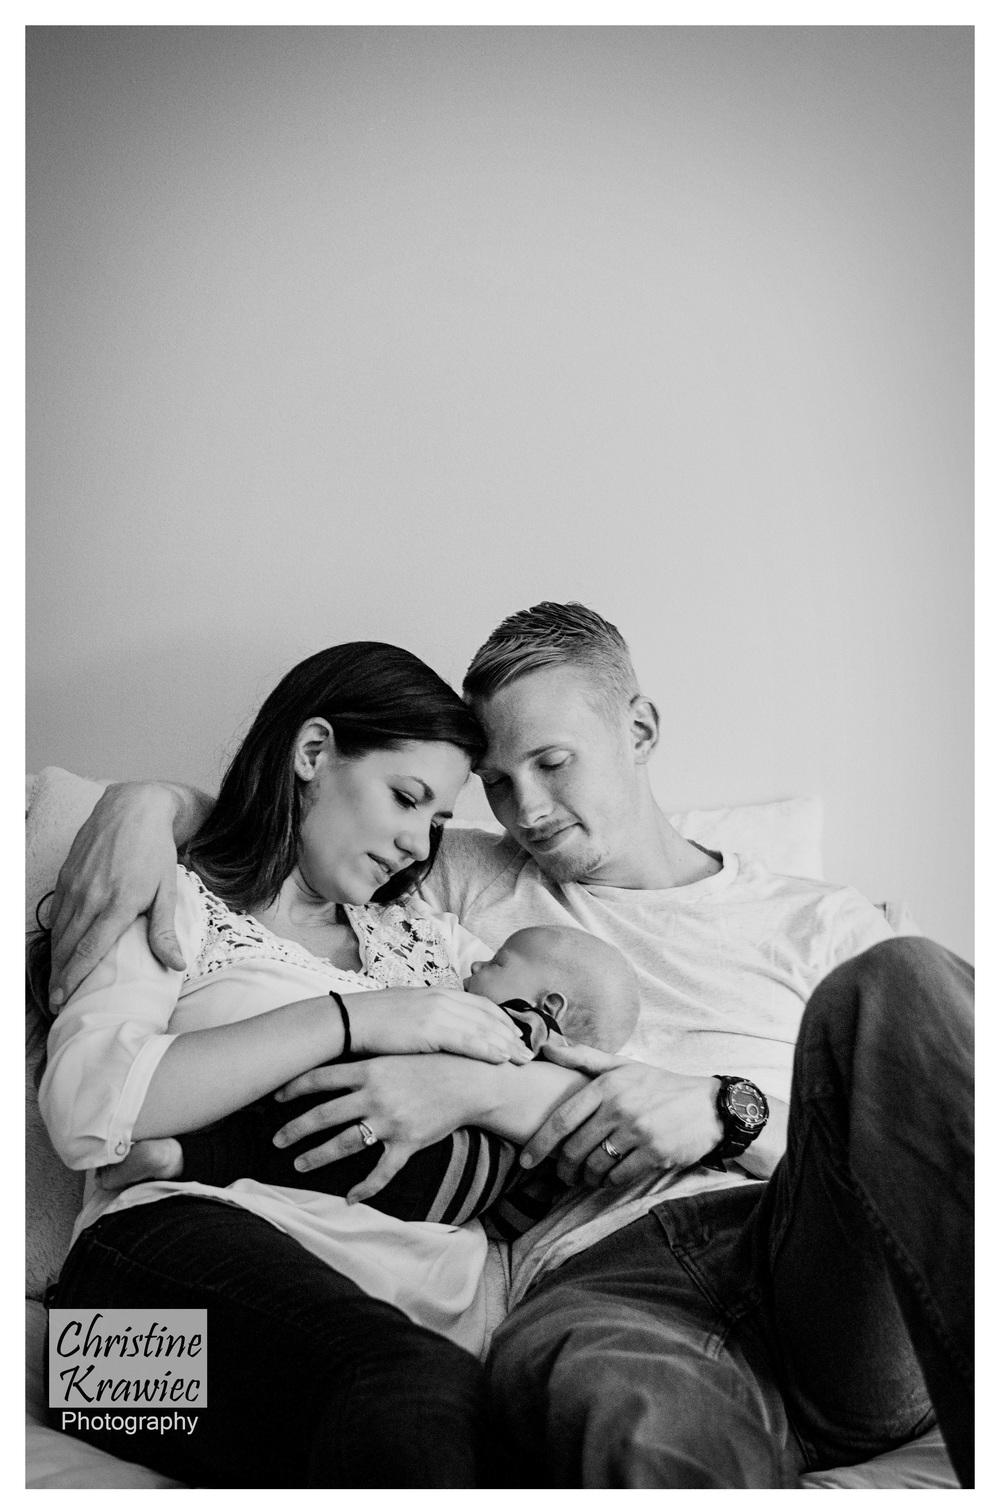 ChristineKrawiecPhotography